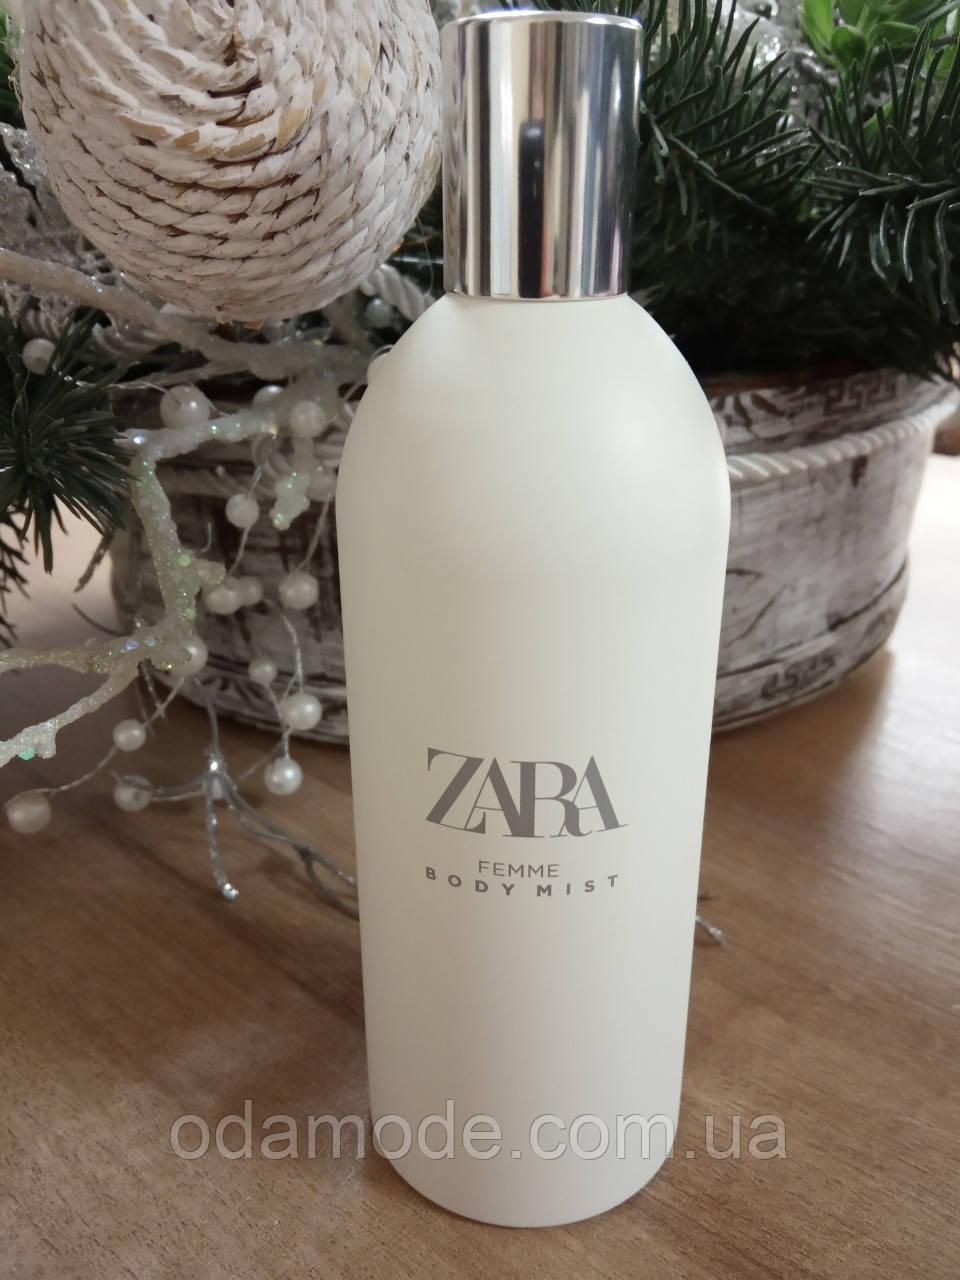 Body Mist Zara Femme 100ml (Испания)